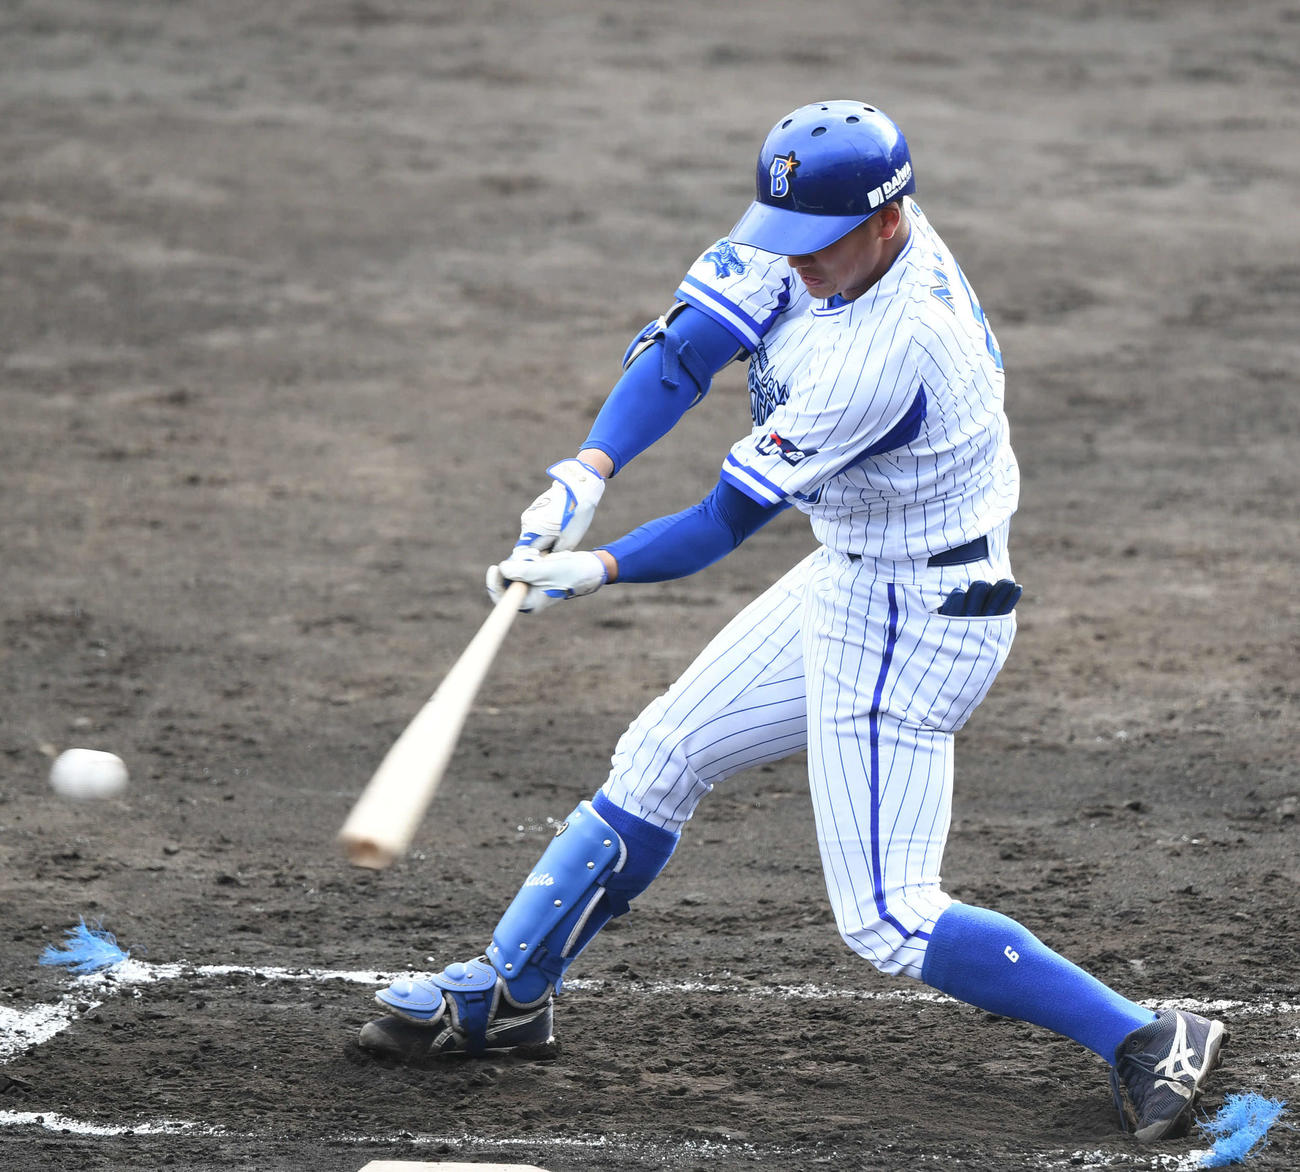 DeNA対BC神奈川 6回裏DeNA無死一塁、森は右前打を放つ(撮影・山崎安昭)